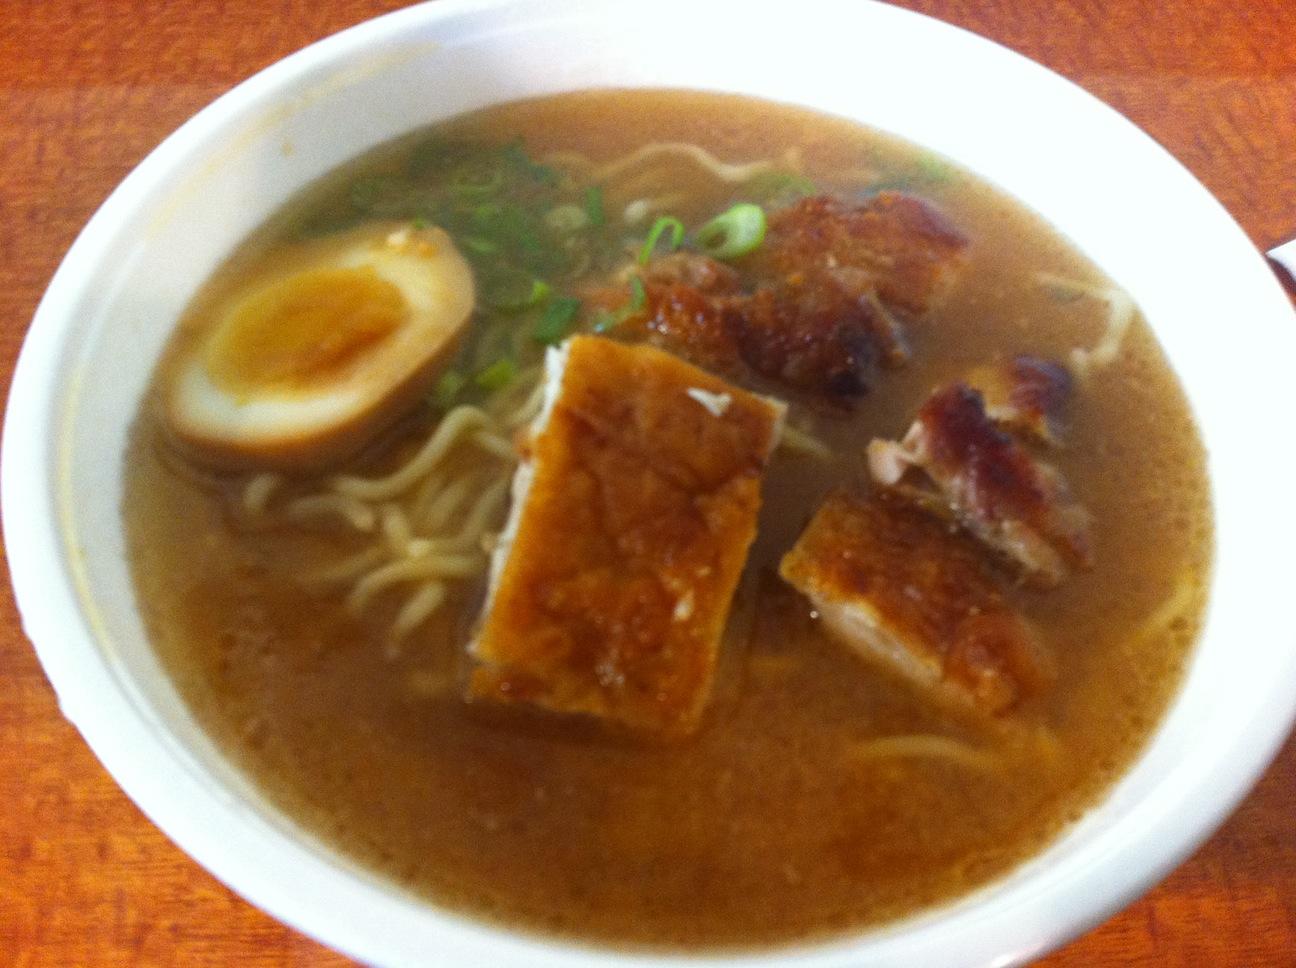 Plum Garden Noodle House   THE FOOD QUEEN – Vancouver food reviews